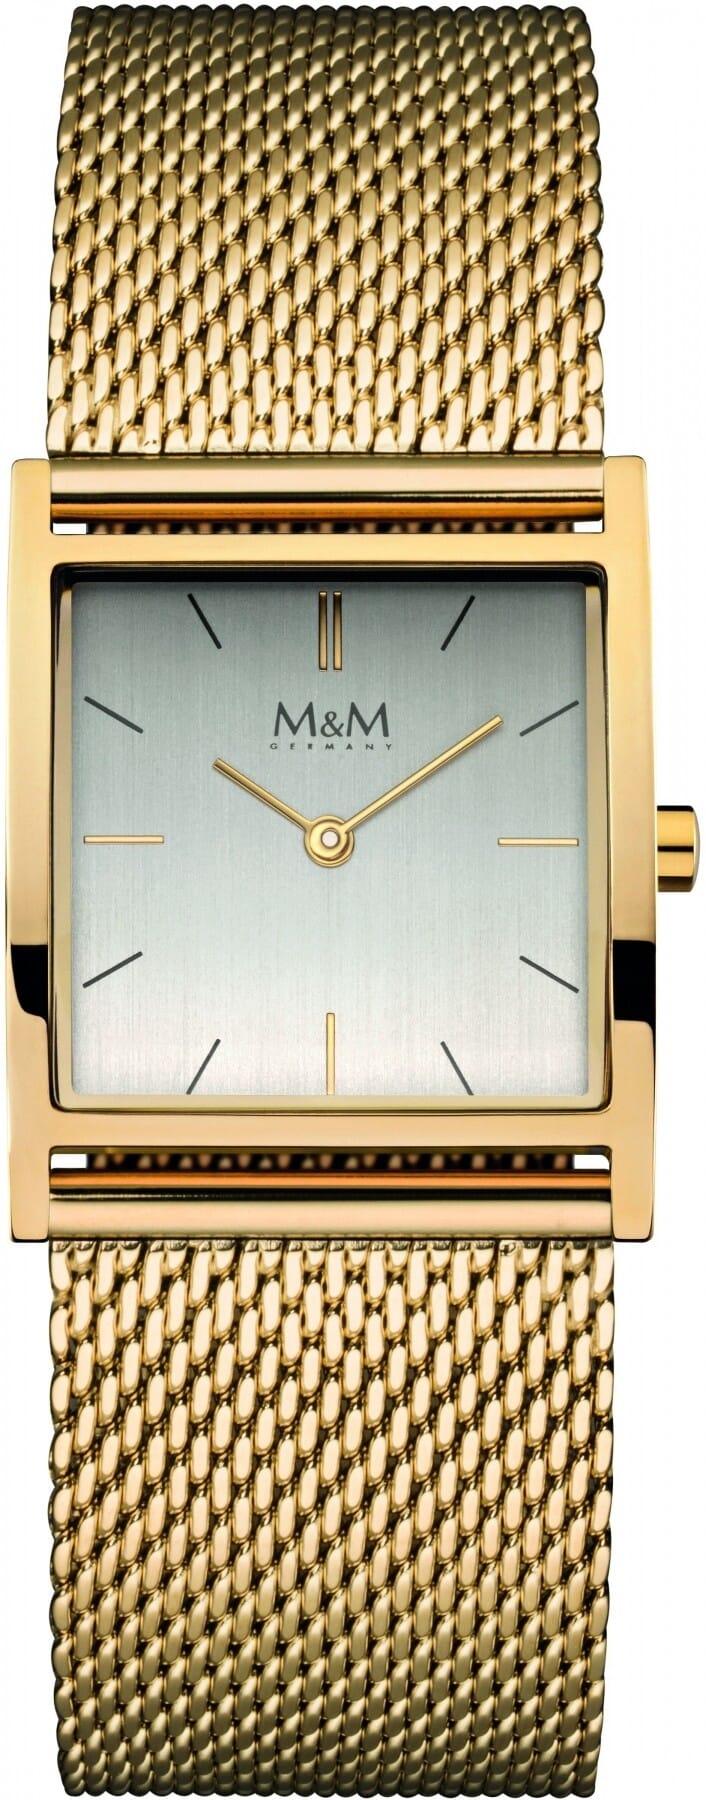 MM Germany M11917-232